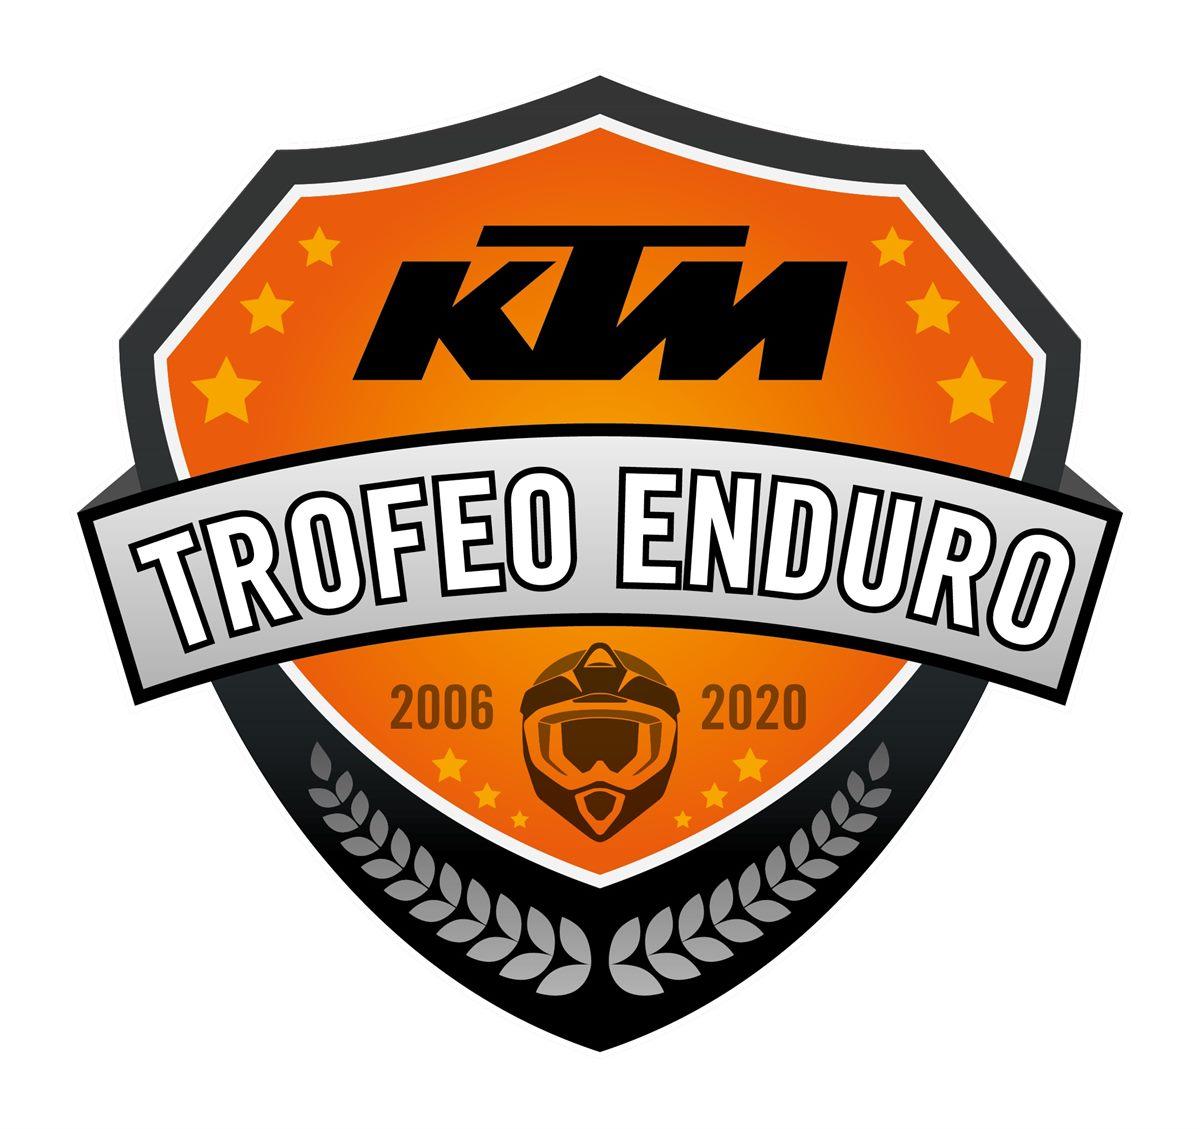 Trofeo enduro KTM A Bibione gran finale 2020